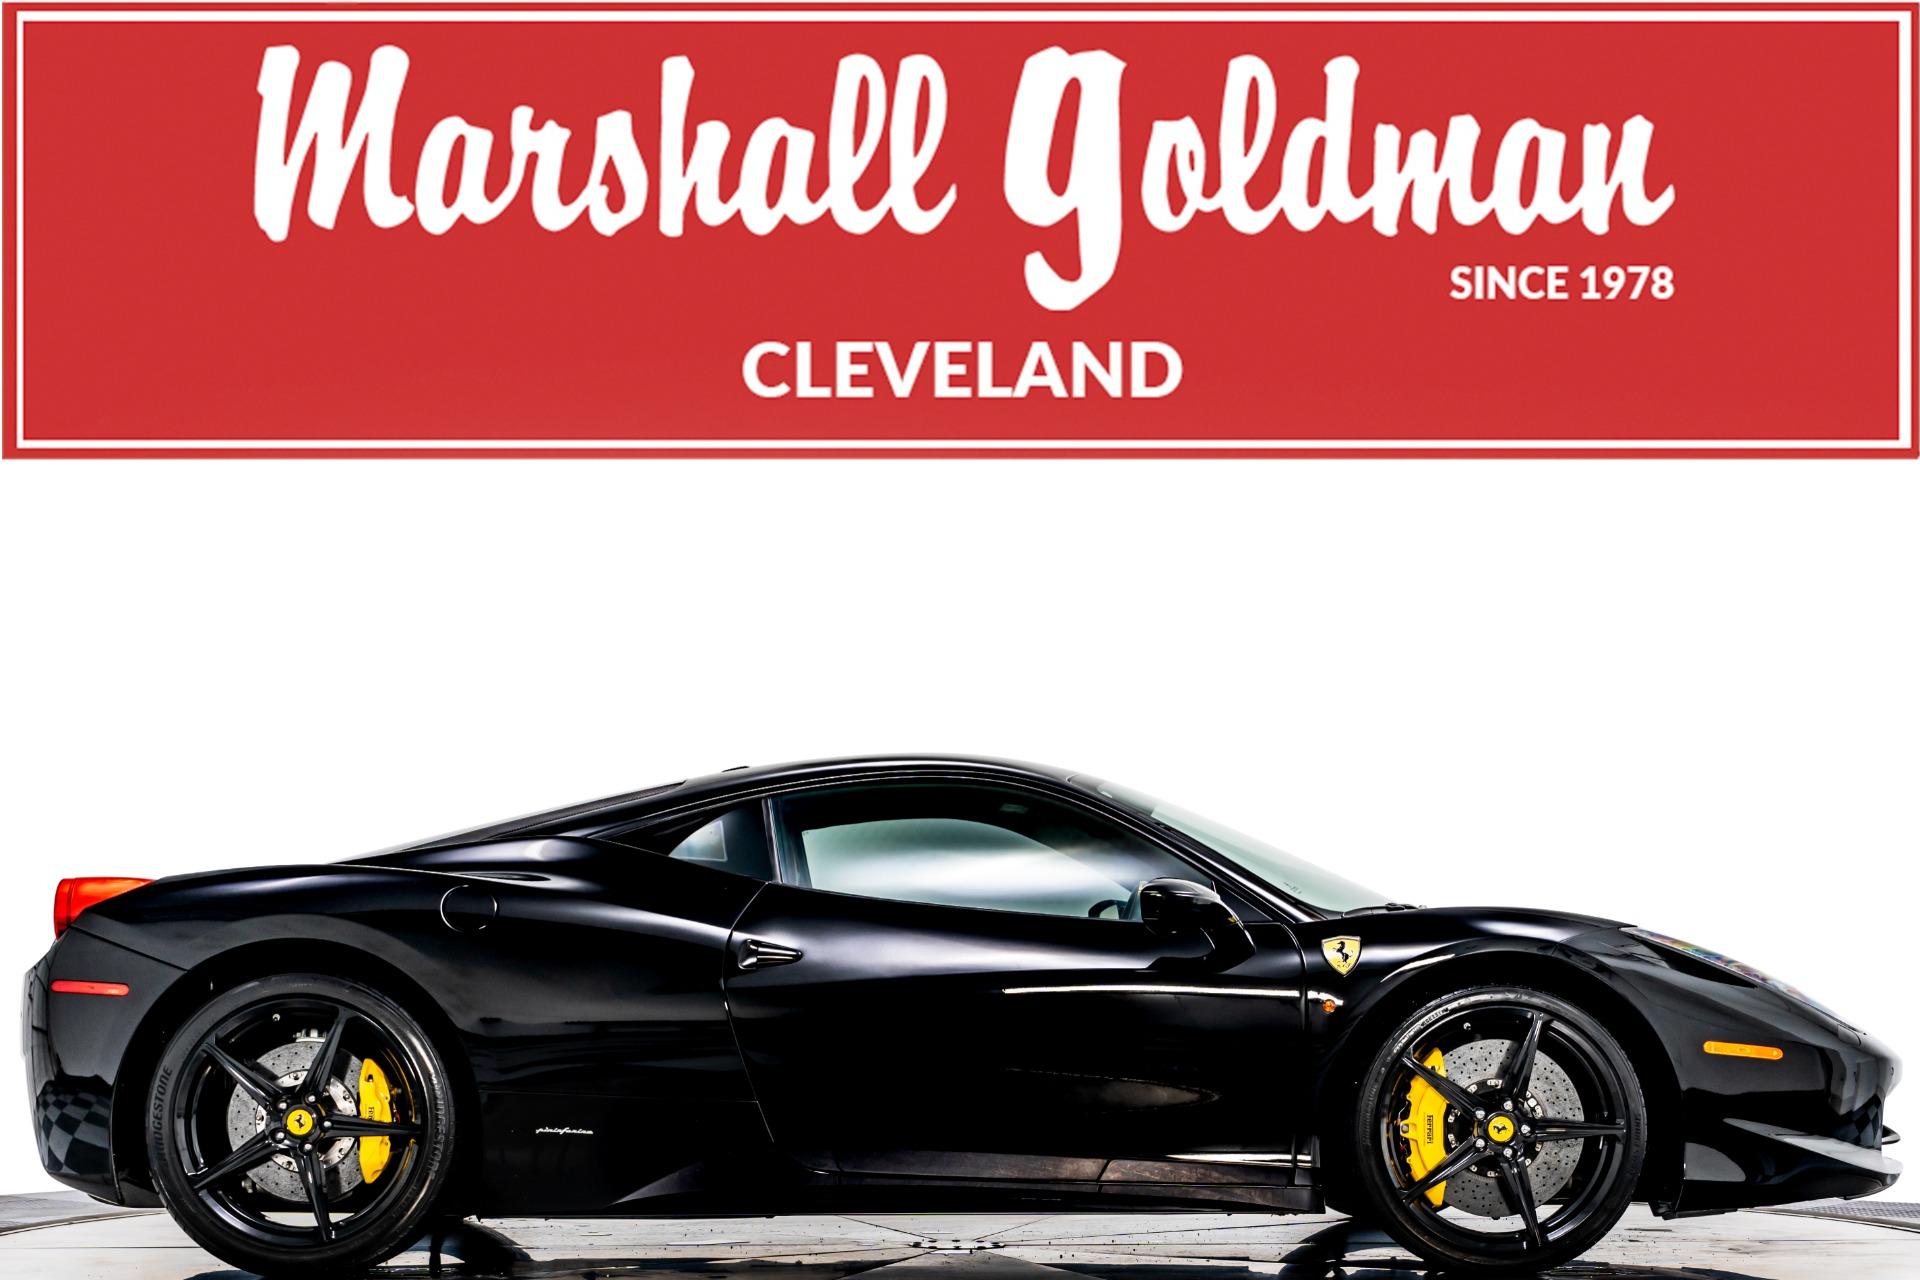 Used 2011 Ferrari 458 Italia For Sale Sold Marshall Goldman Cleveland Stock W21400